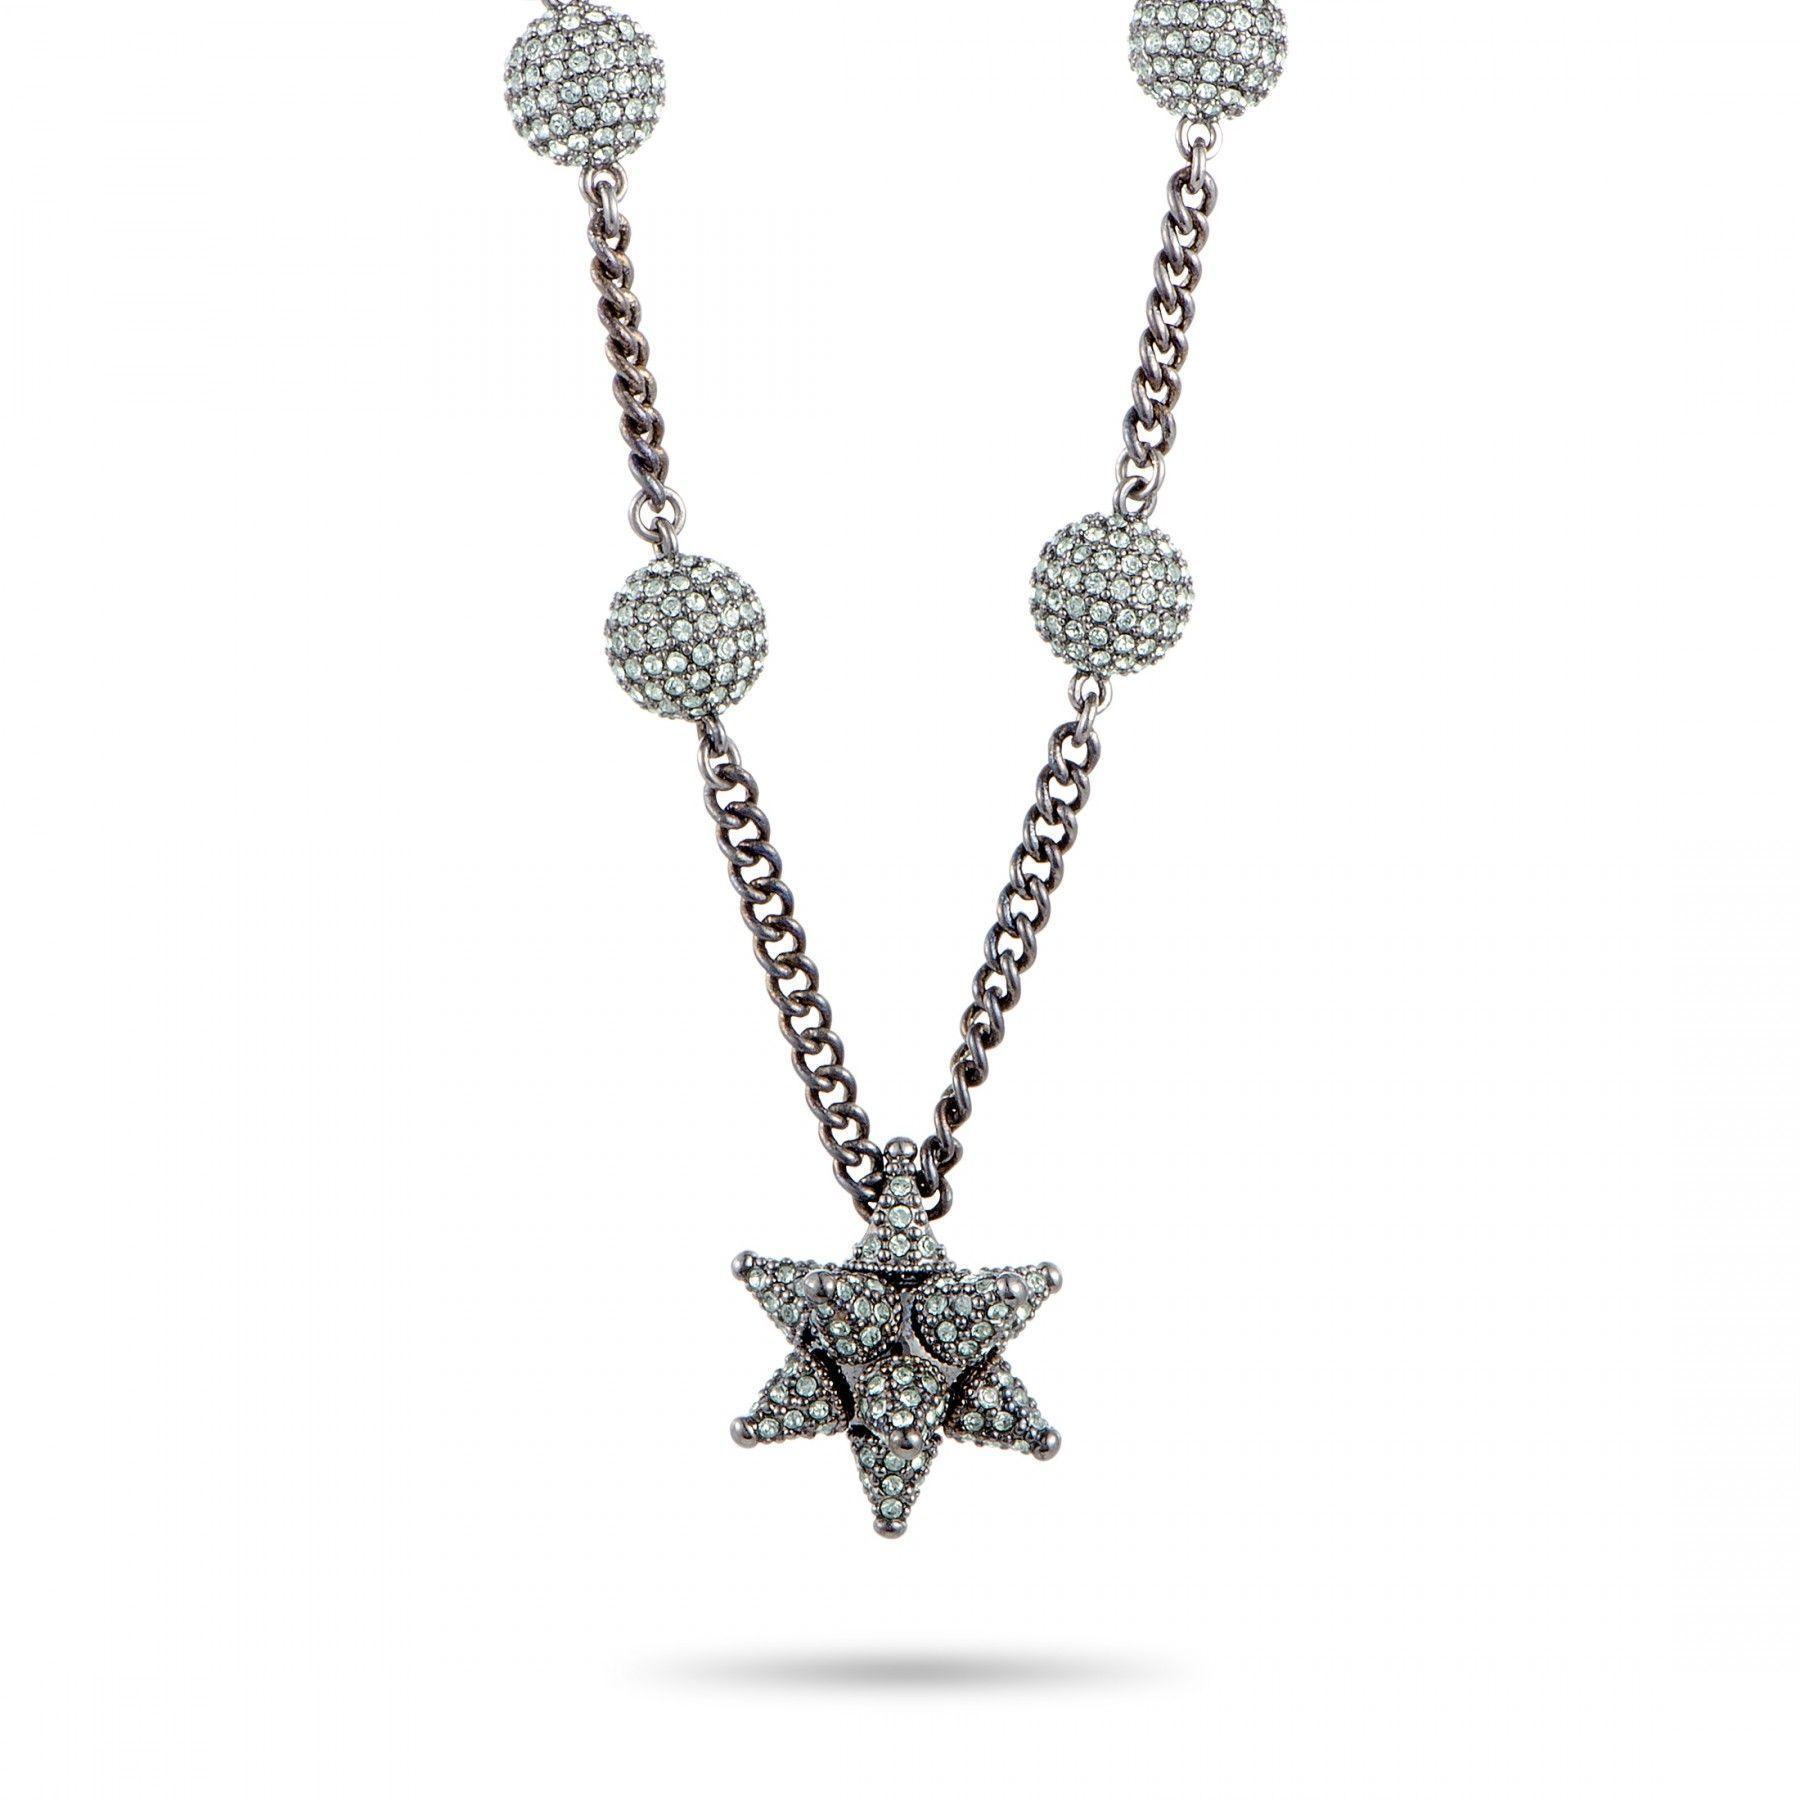 swarovski as kalix crystal ruthenium